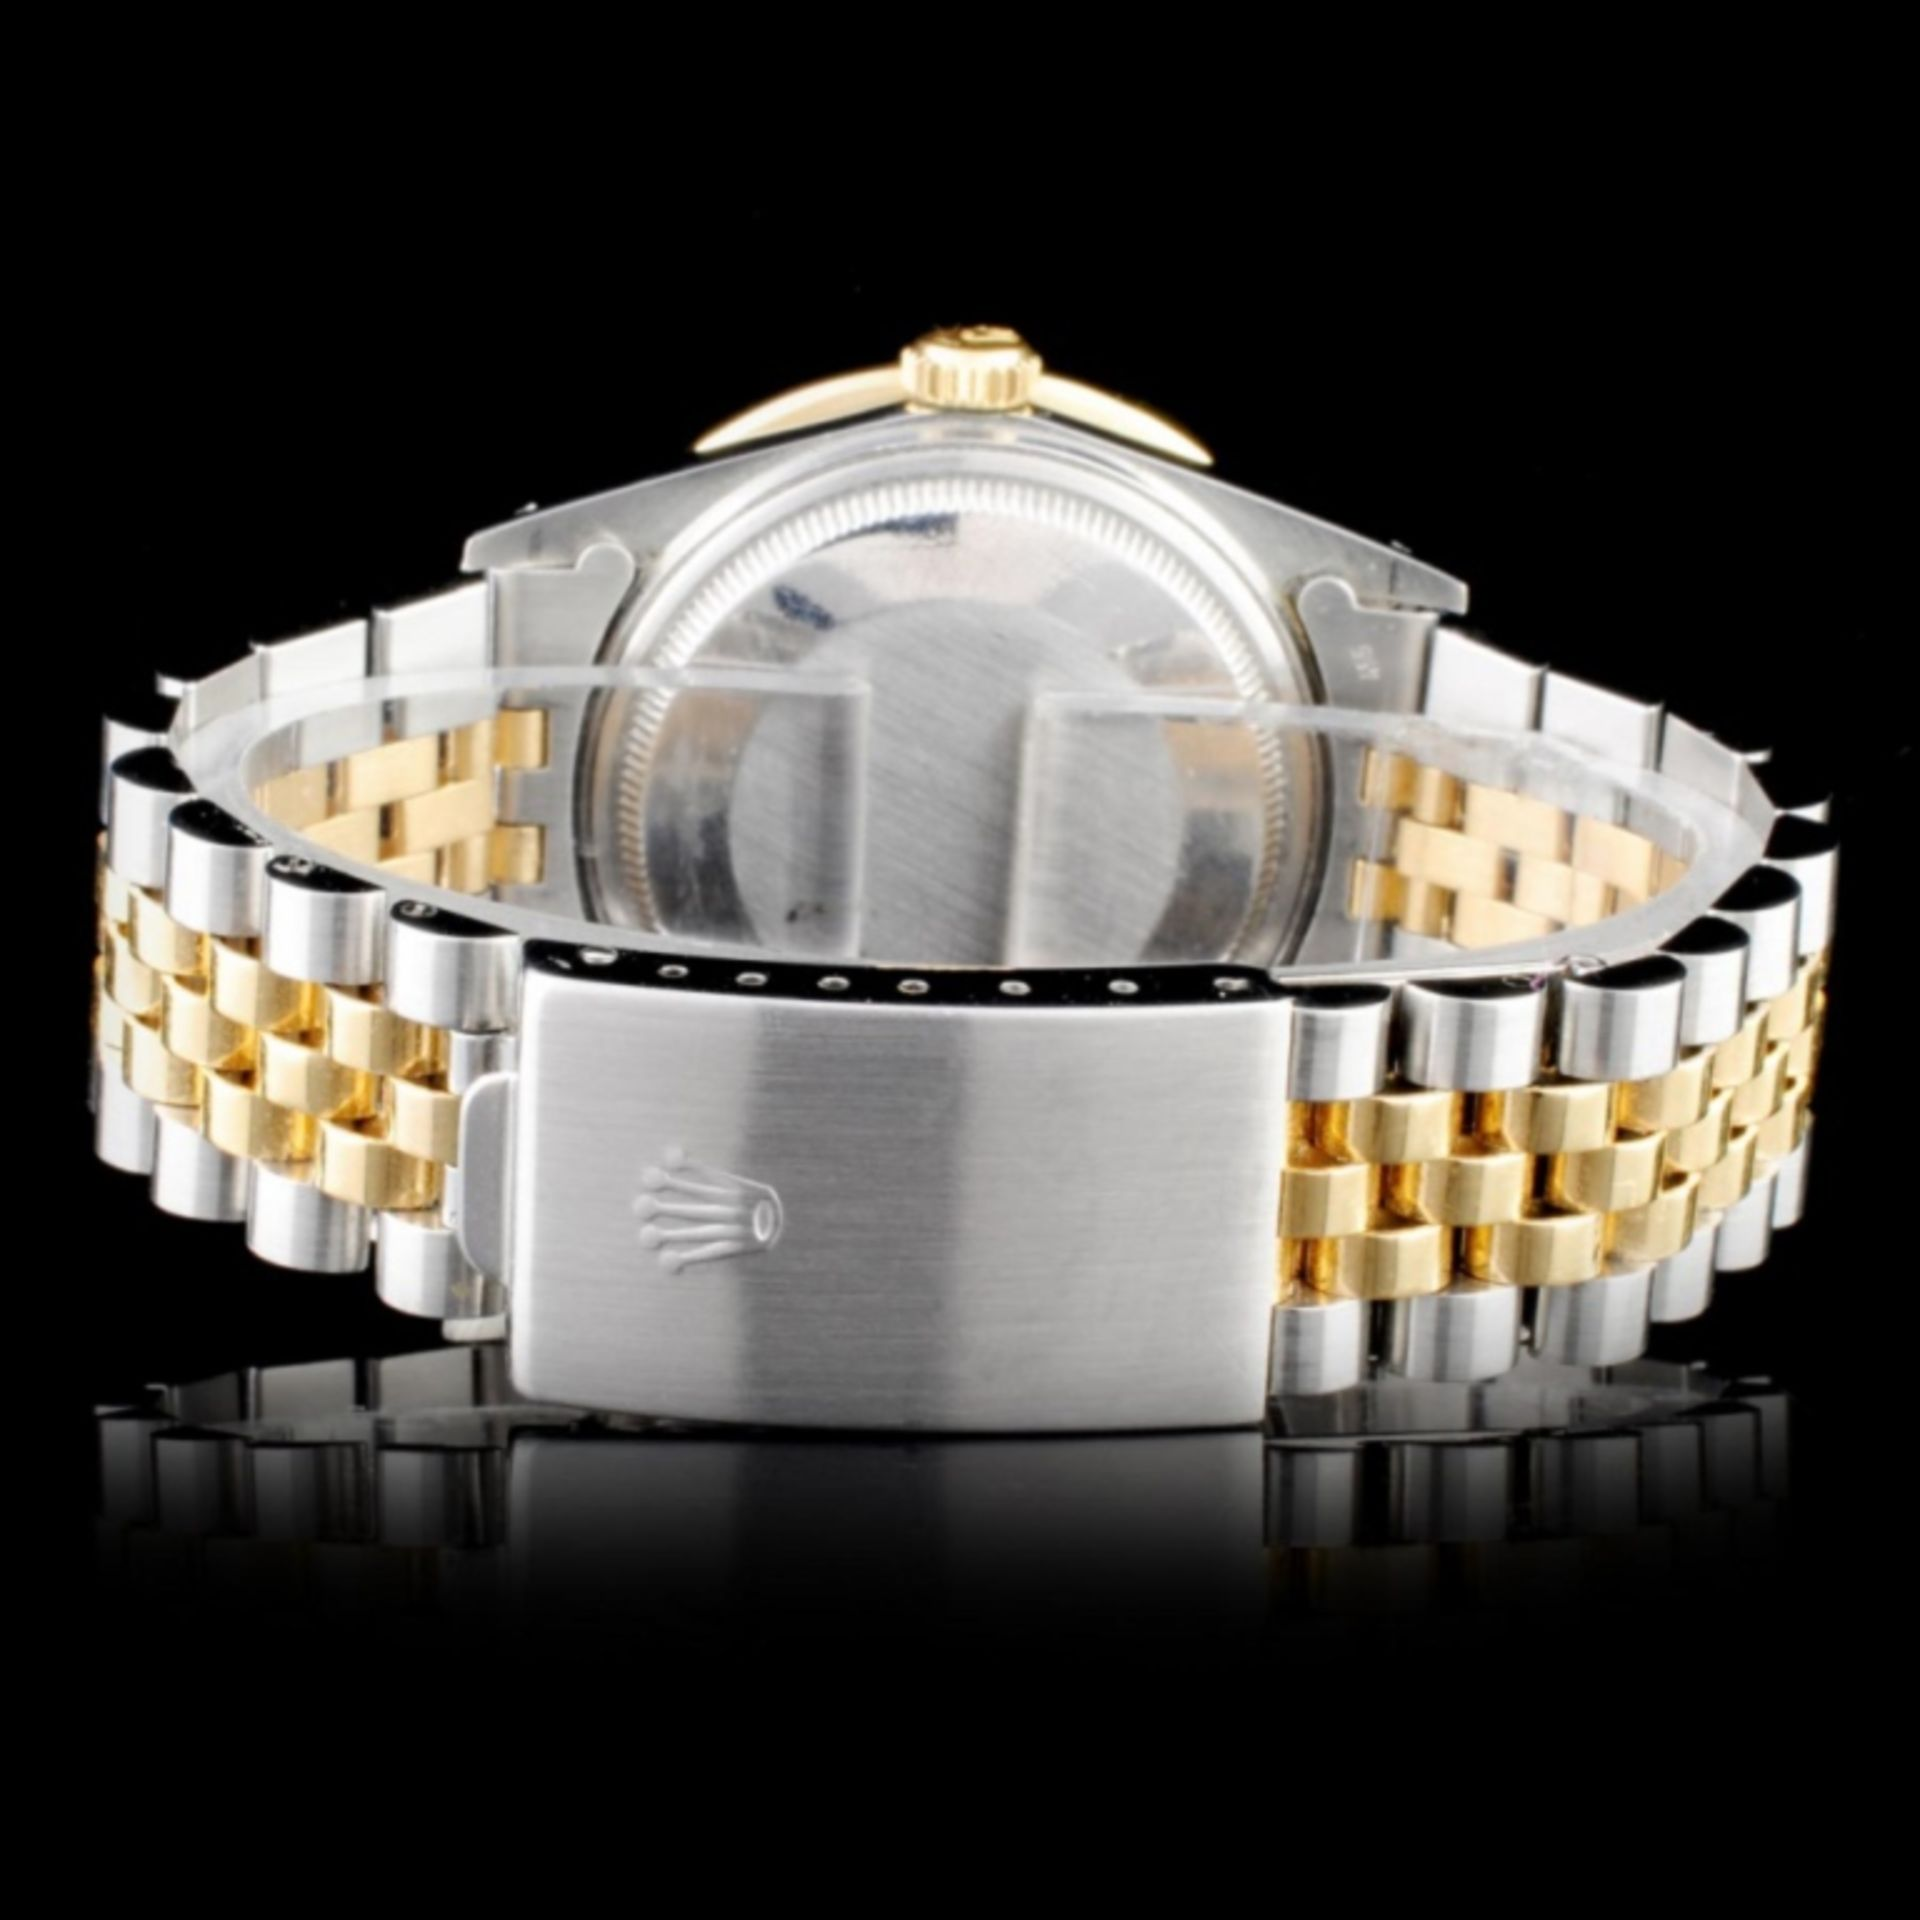 Rolex YG/SS DateJust Diamond 36MM Wristwatch - Image 3 of 5